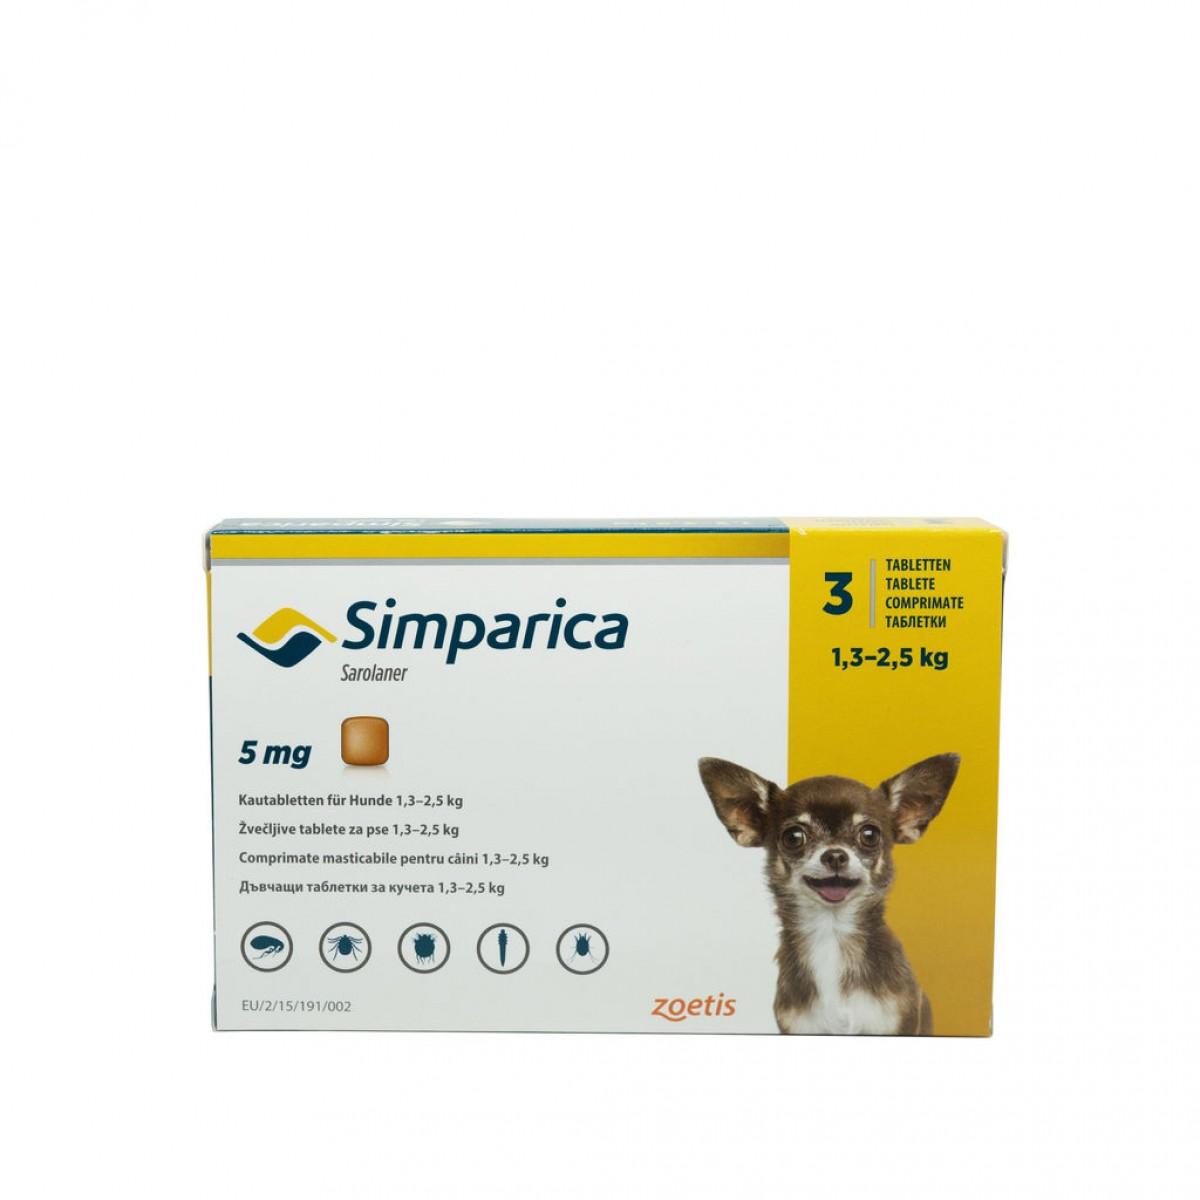 Comprimat masticabil antiparazitar Simparica 5 mg pentru câini de 1.3 - 2.5 kg